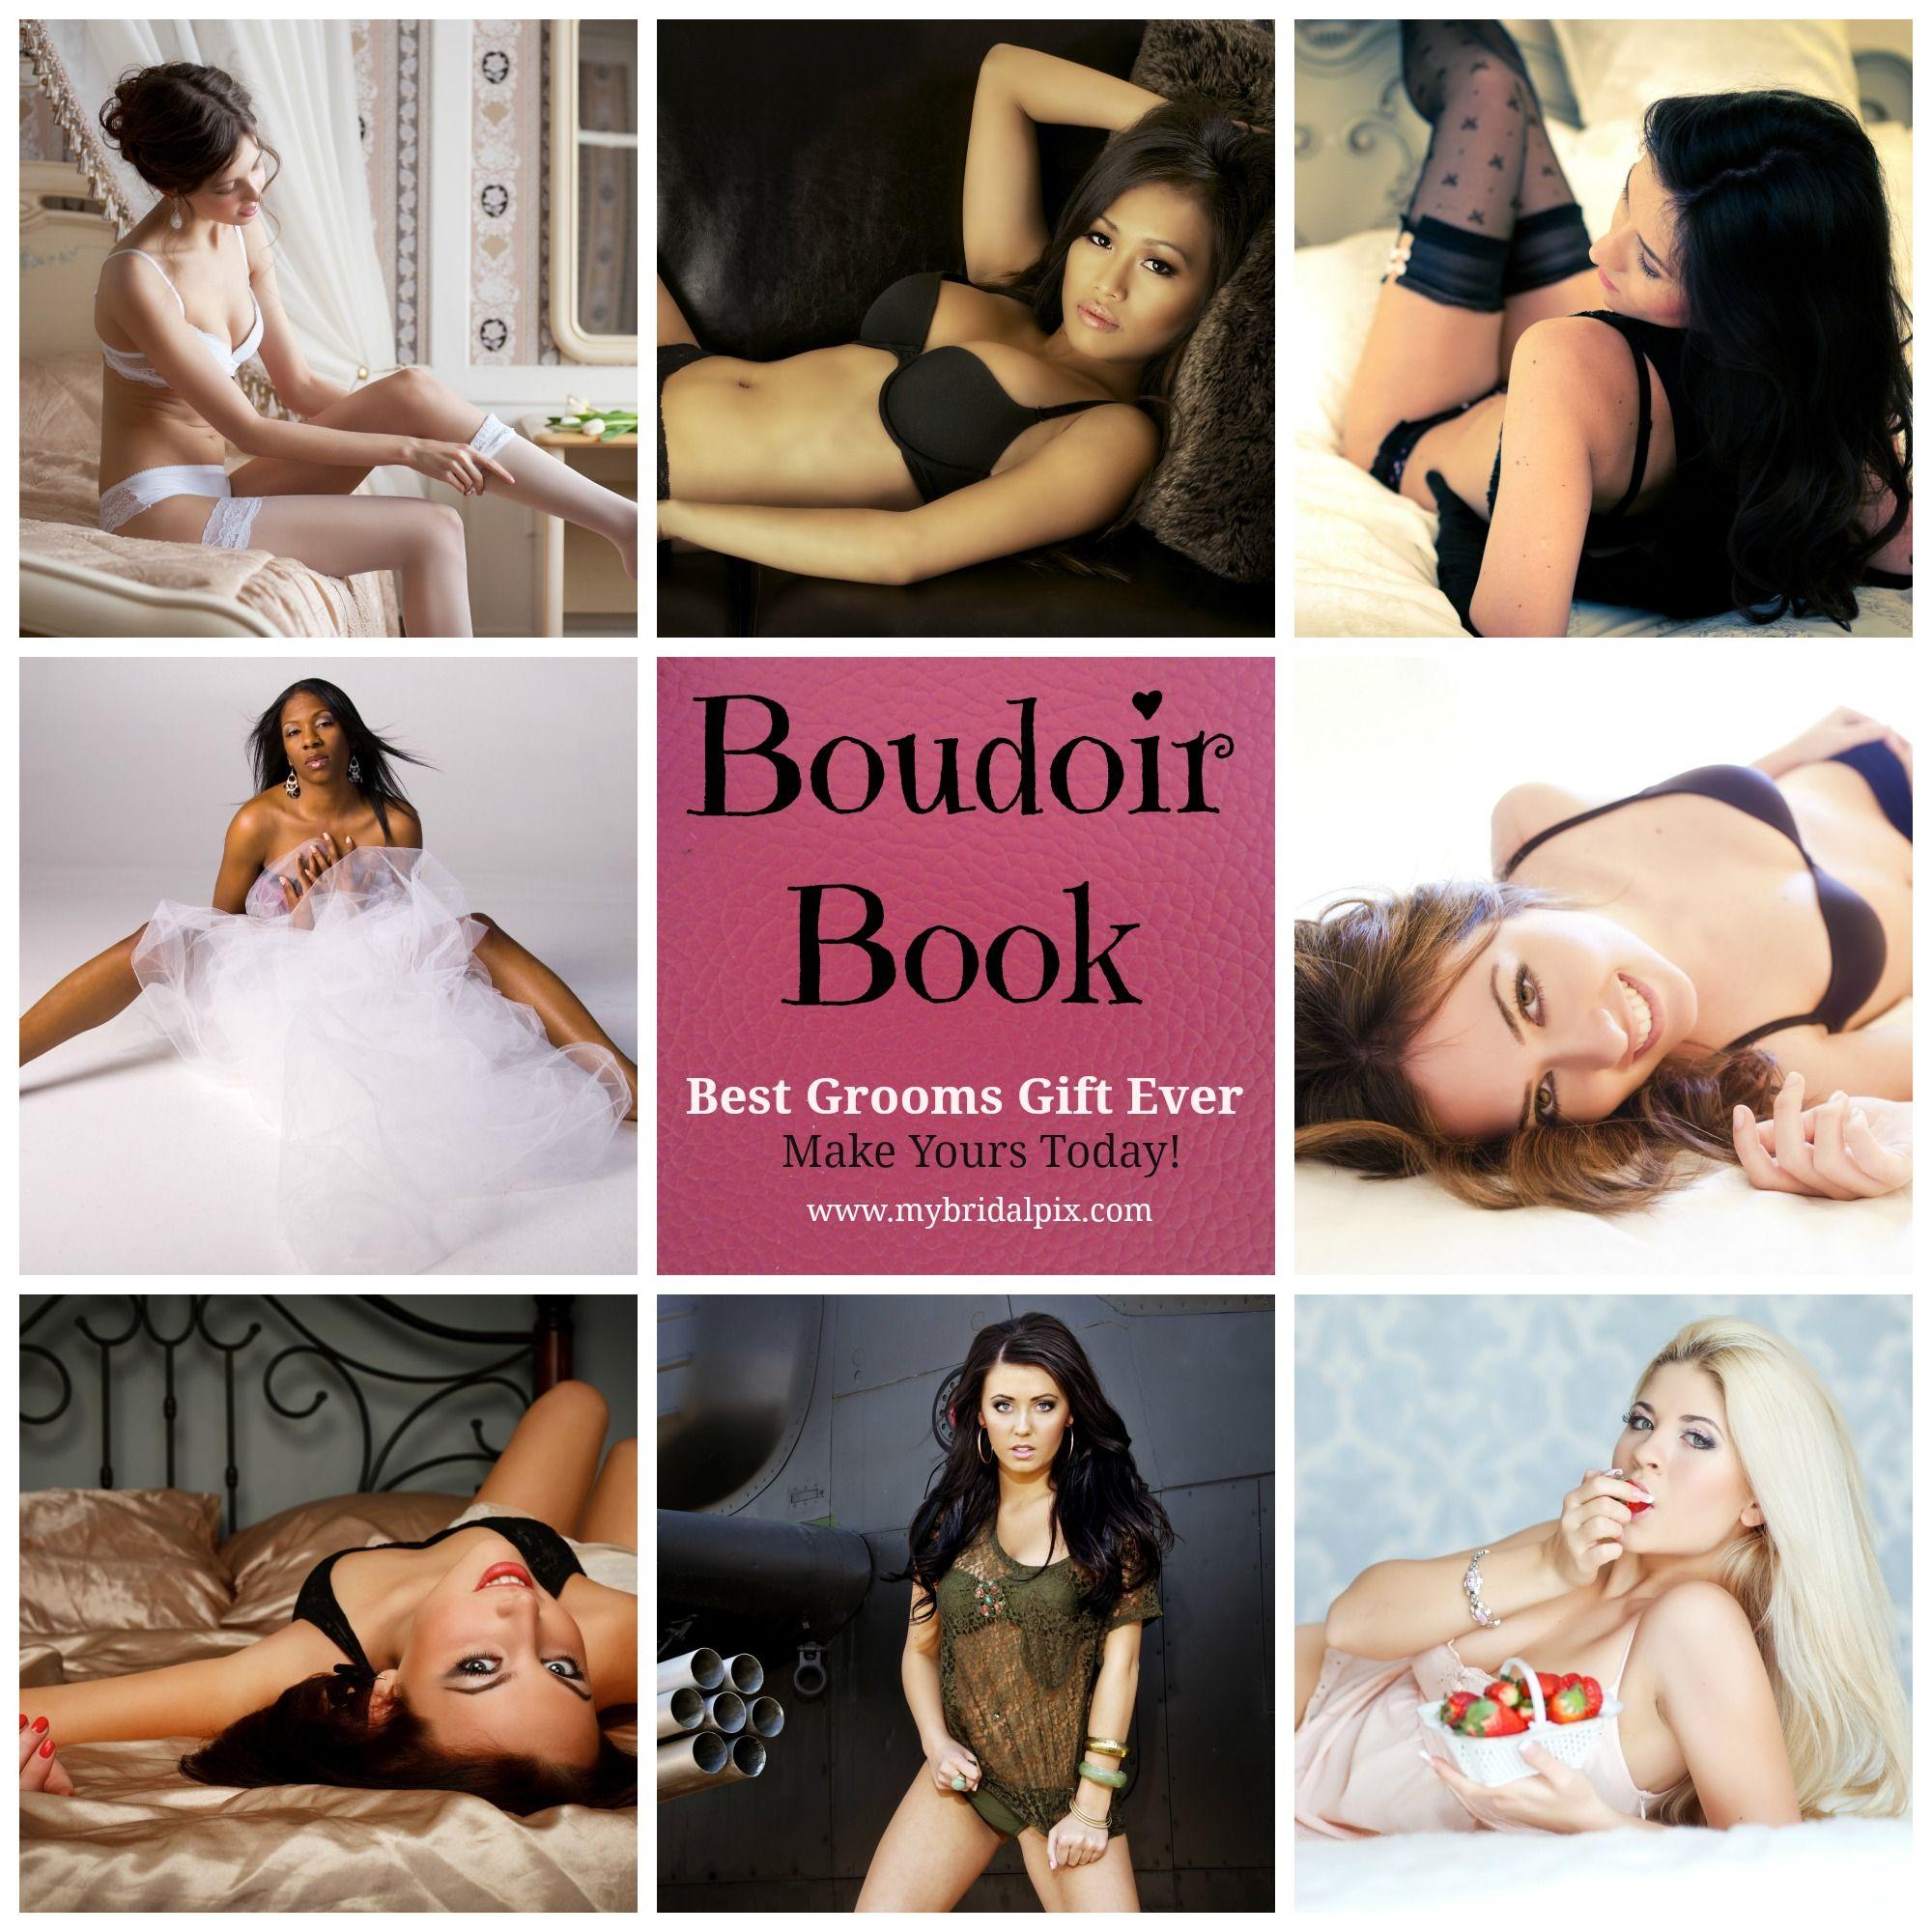 Bridal Boudoir Book for Grooms Gift